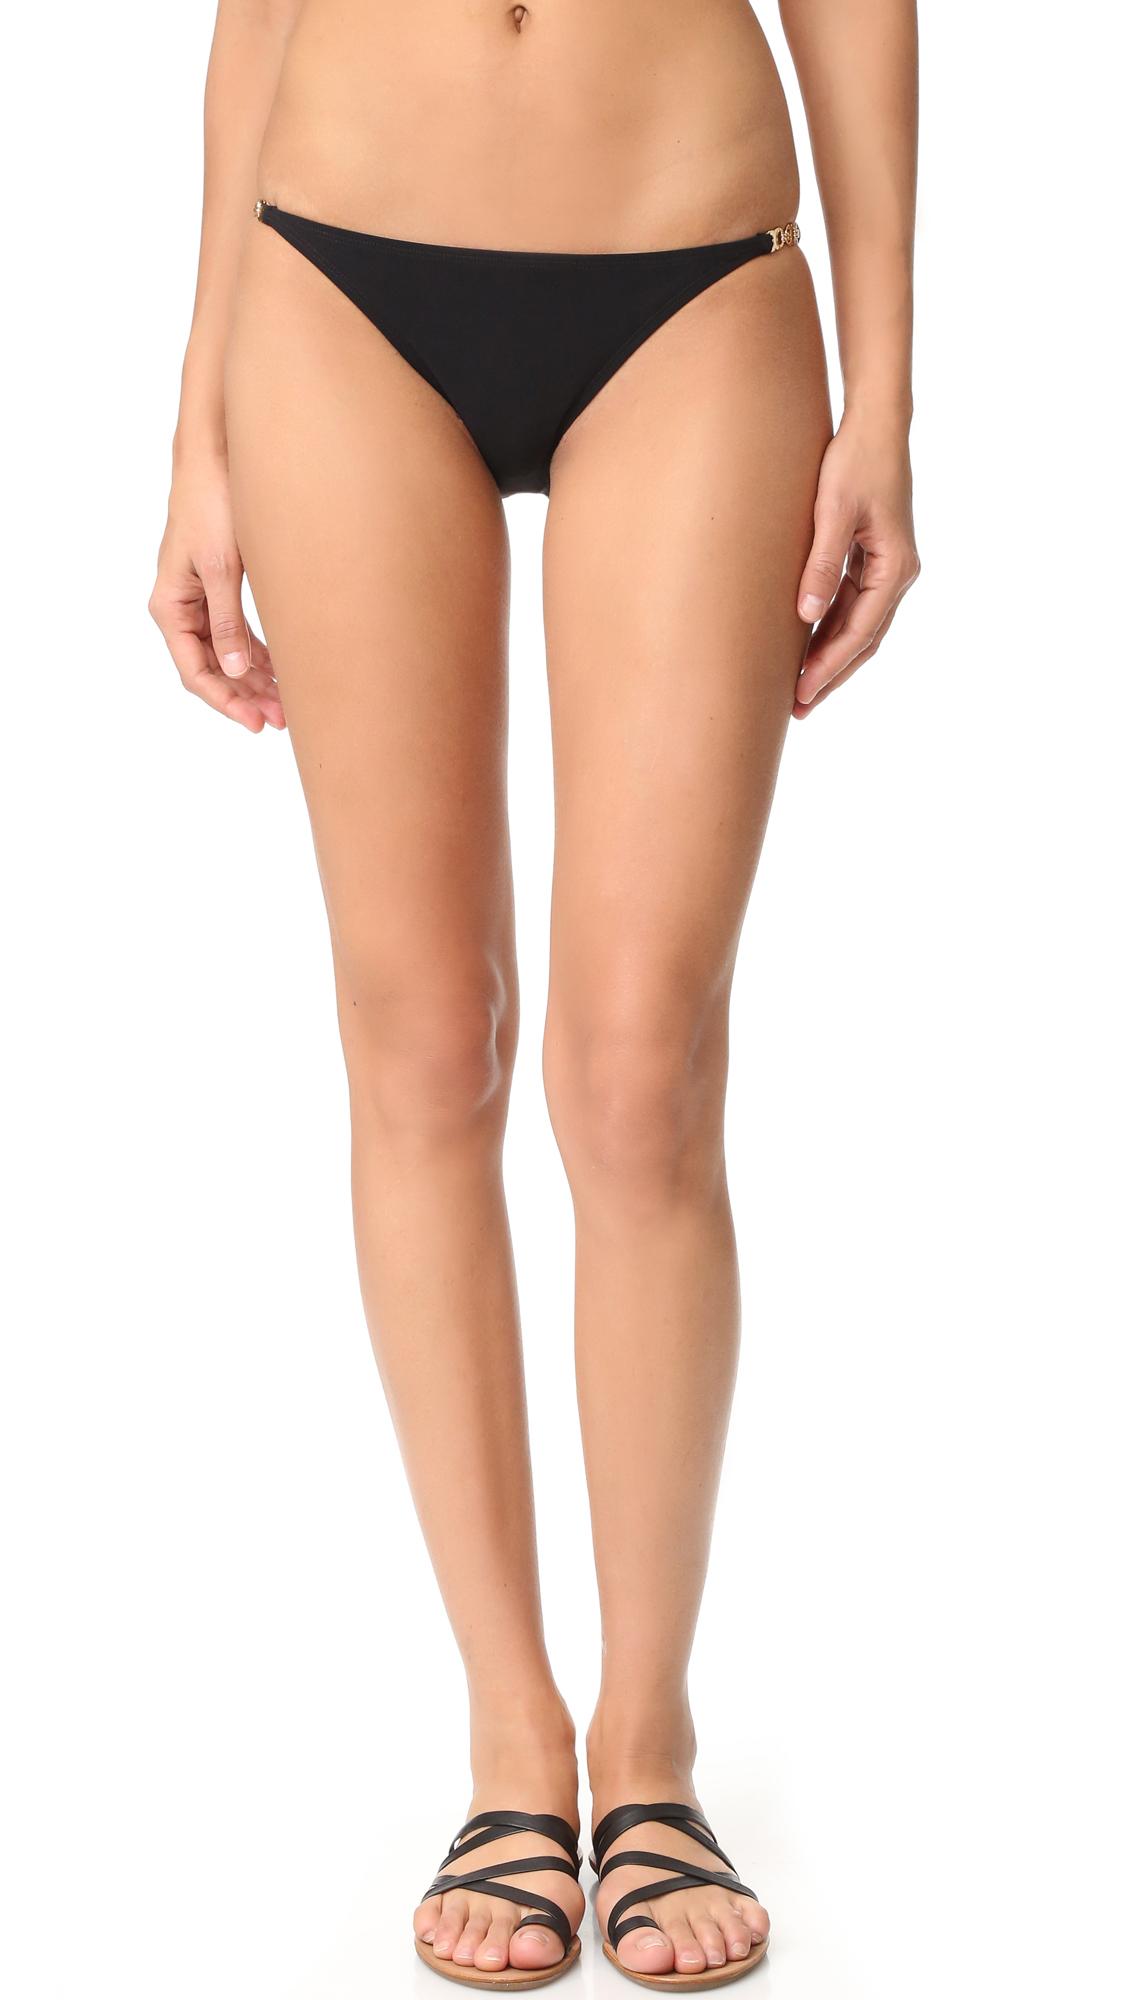 Tory Burch Gemini Link Bikini Bottoms - Black